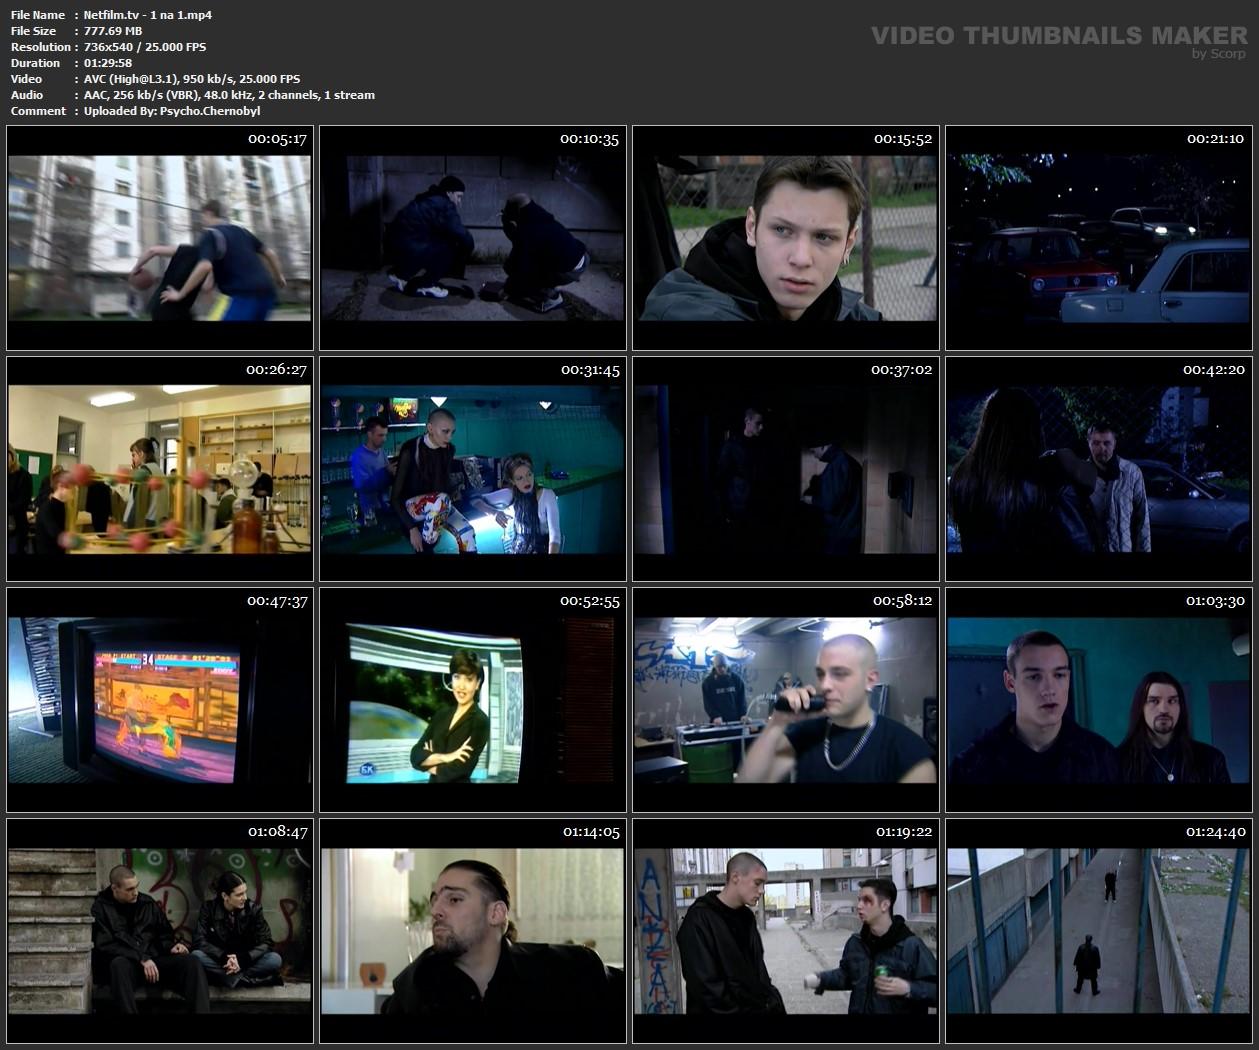 Netfilm-tv-1-na-1-mp4.jpg